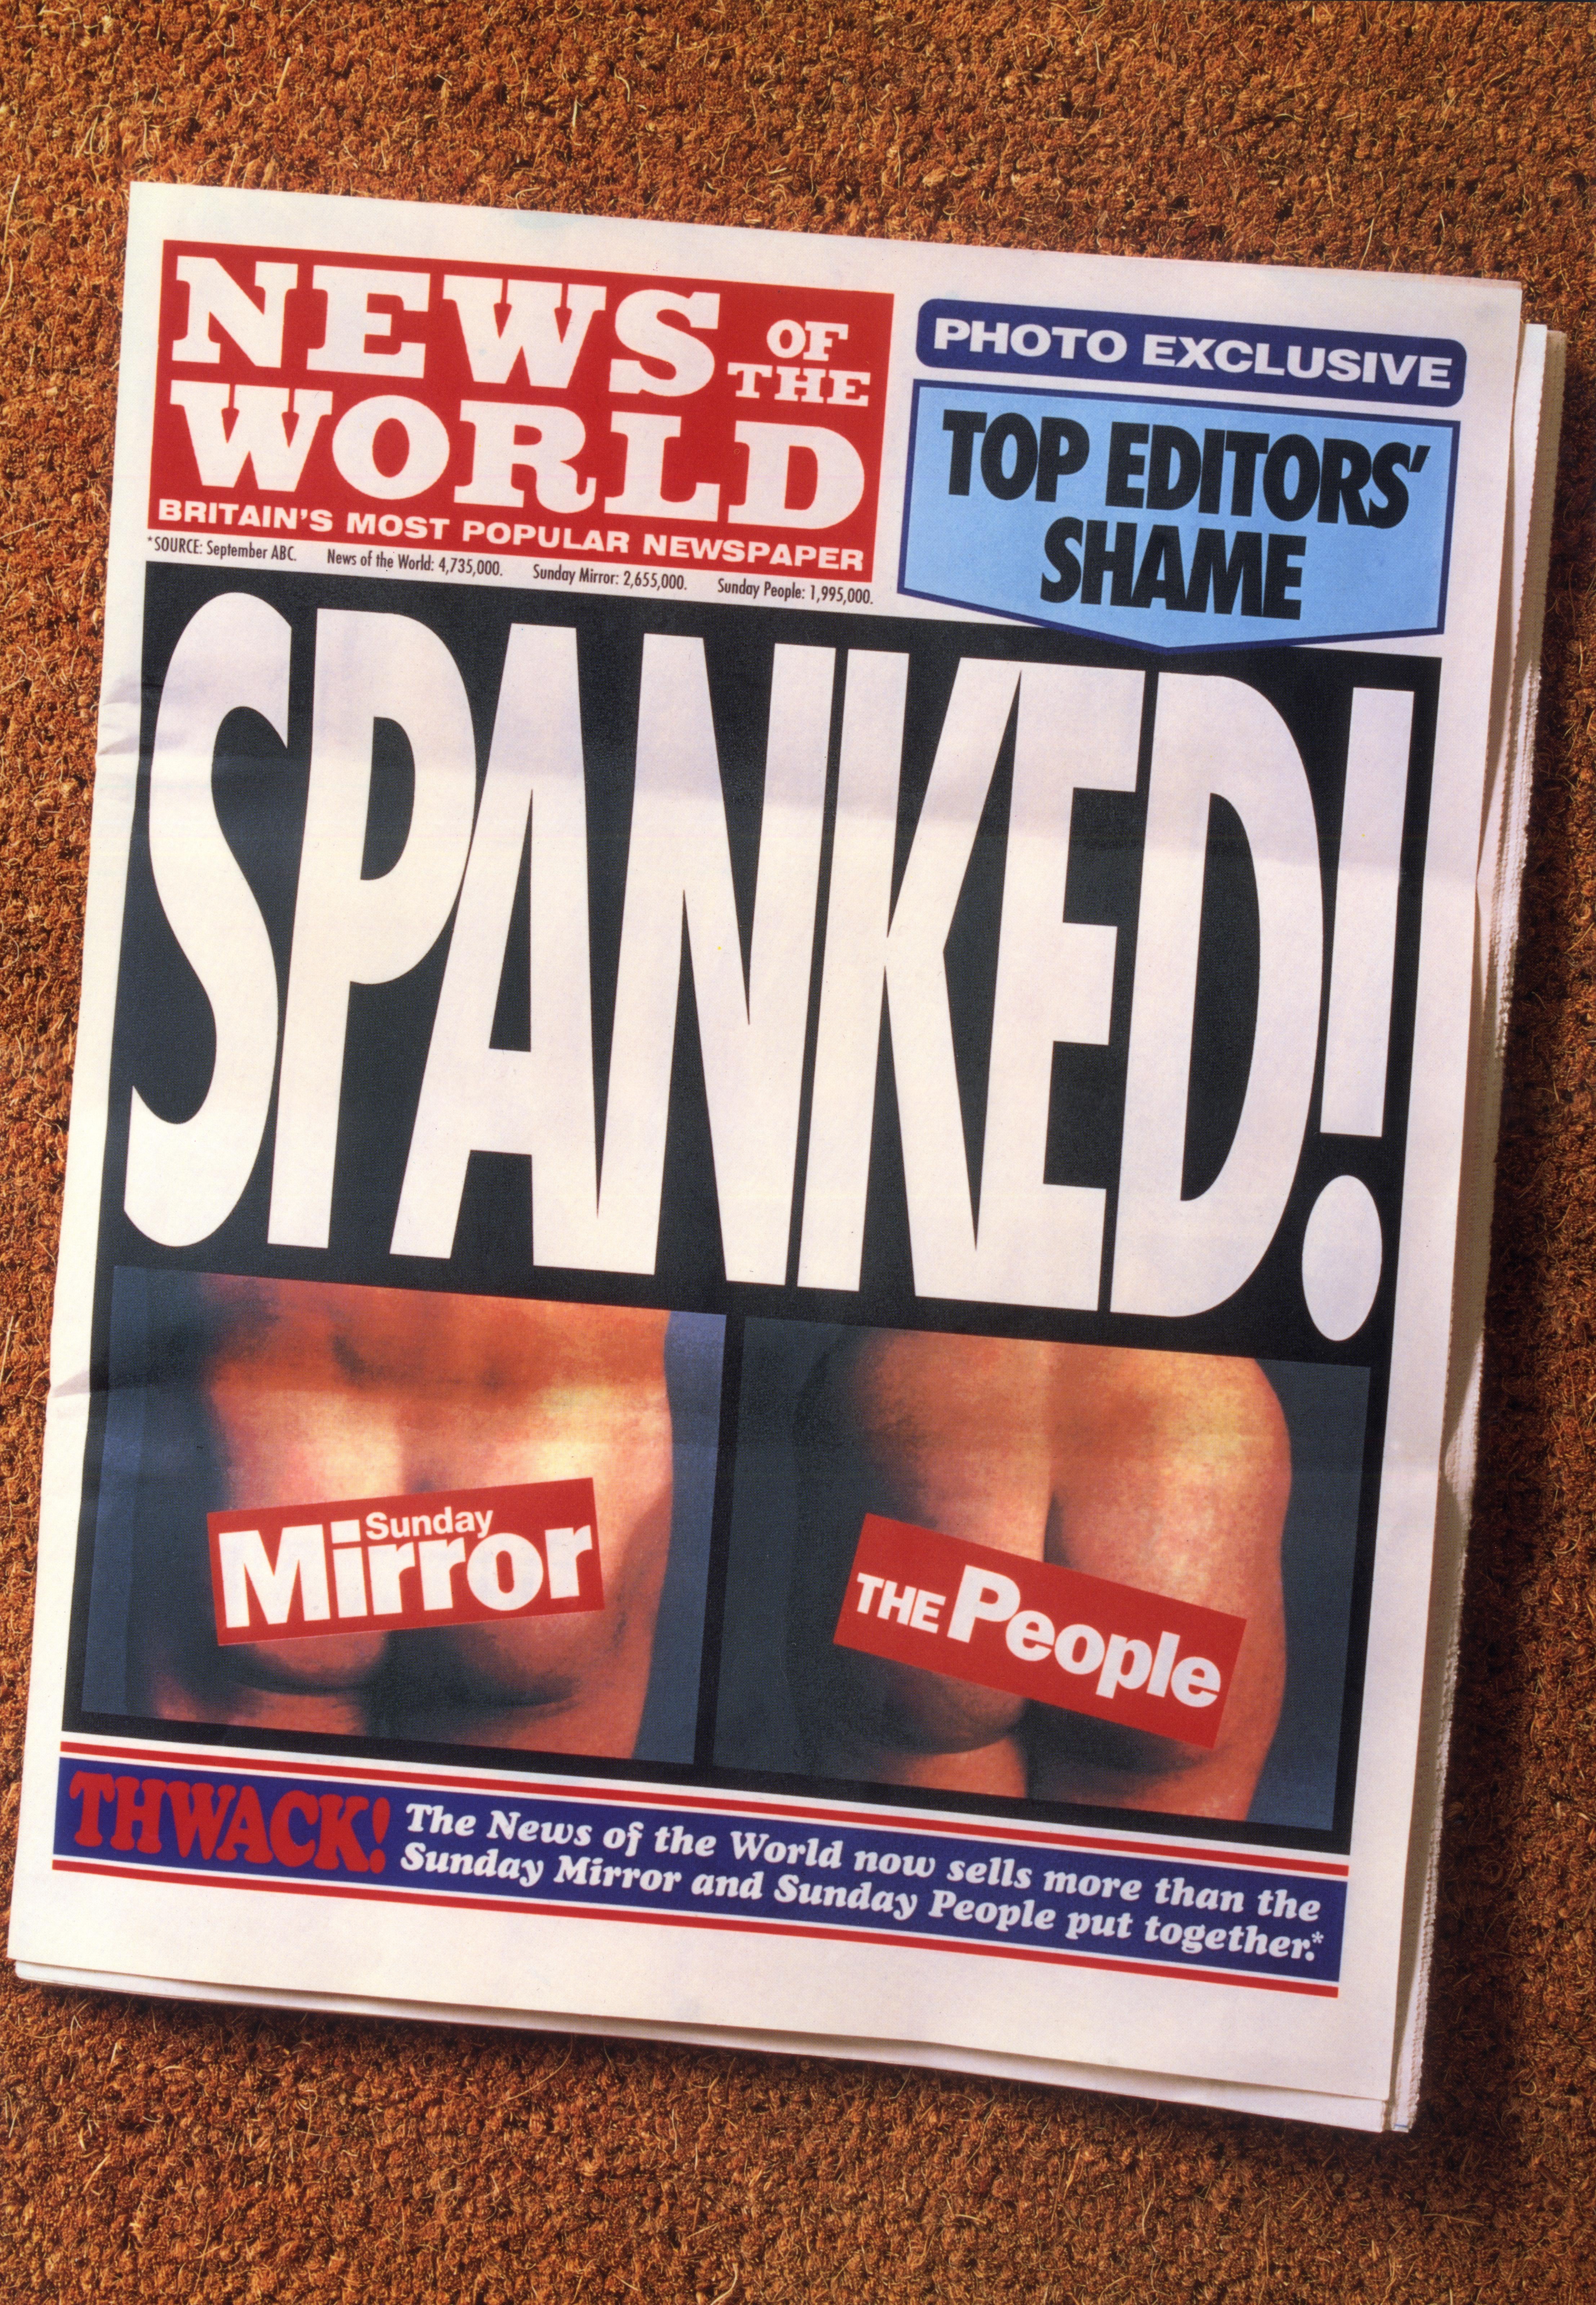 spanked-news-of-the-world-dave-dye-spdcj